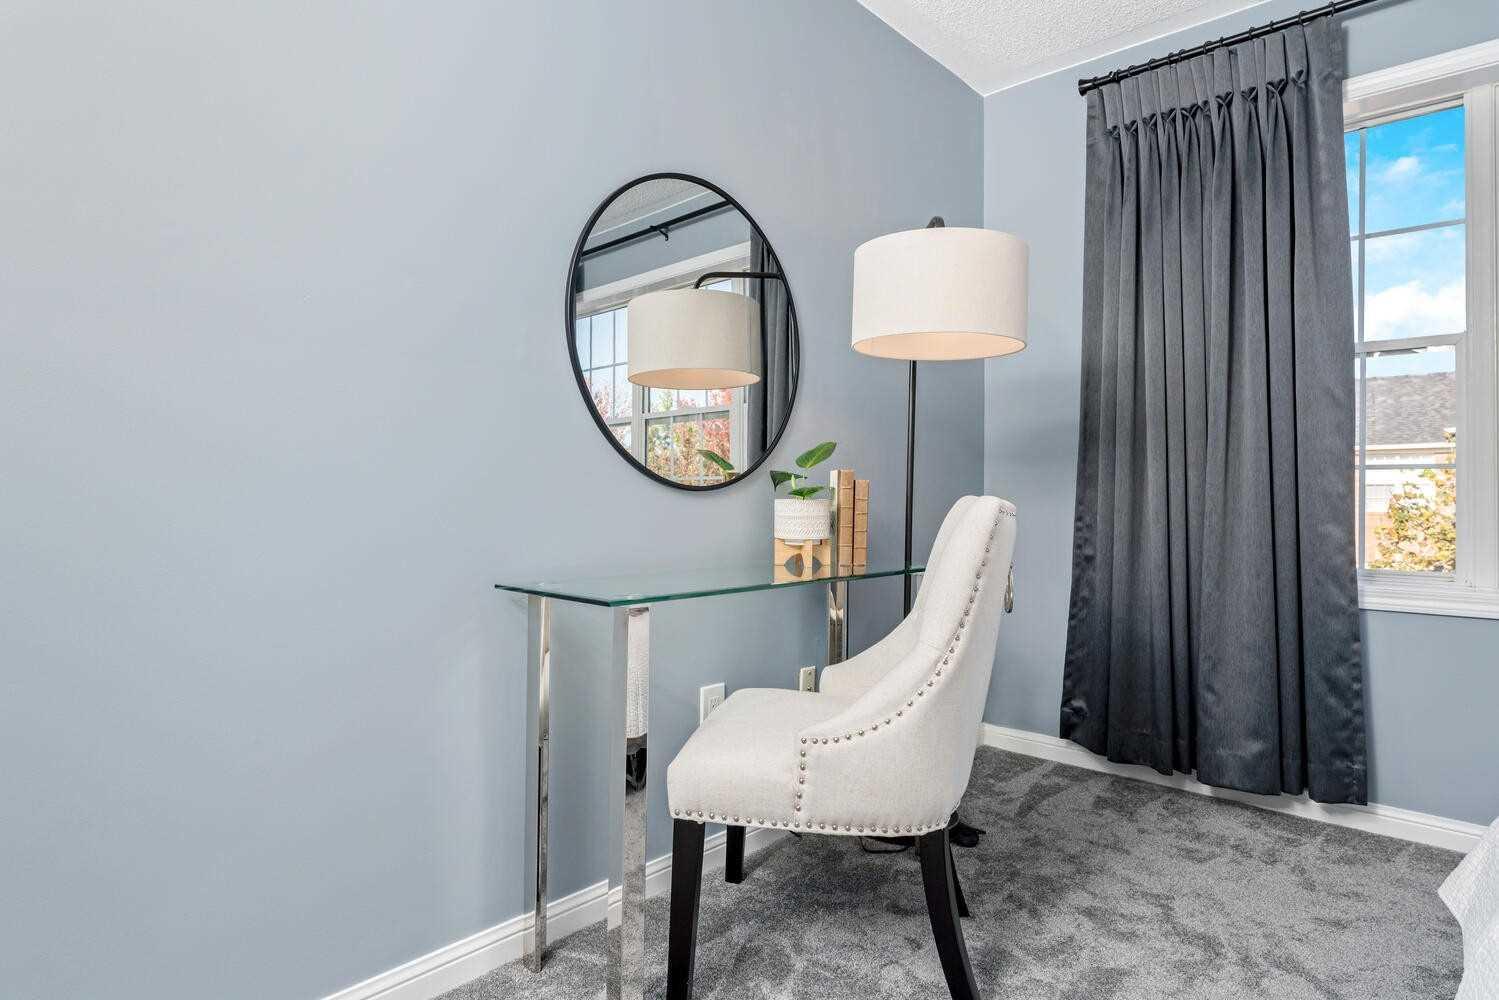 1030 Barclay Circ - Beaty Att/Row/Twnhouse for sale, 3 Bedrooms (W5400435) - #20